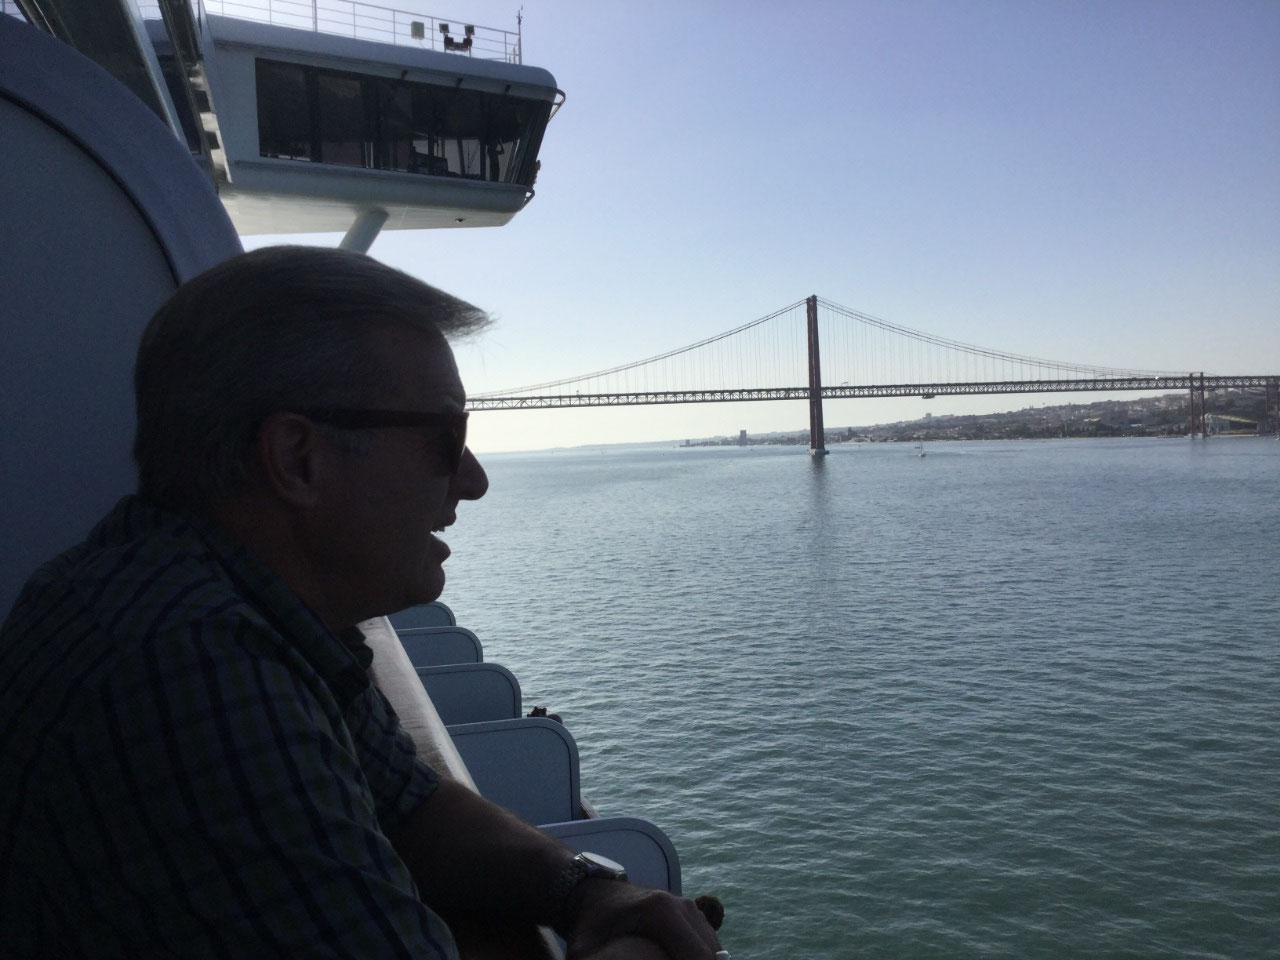 Ponte 25 de Abril Bridge in the background